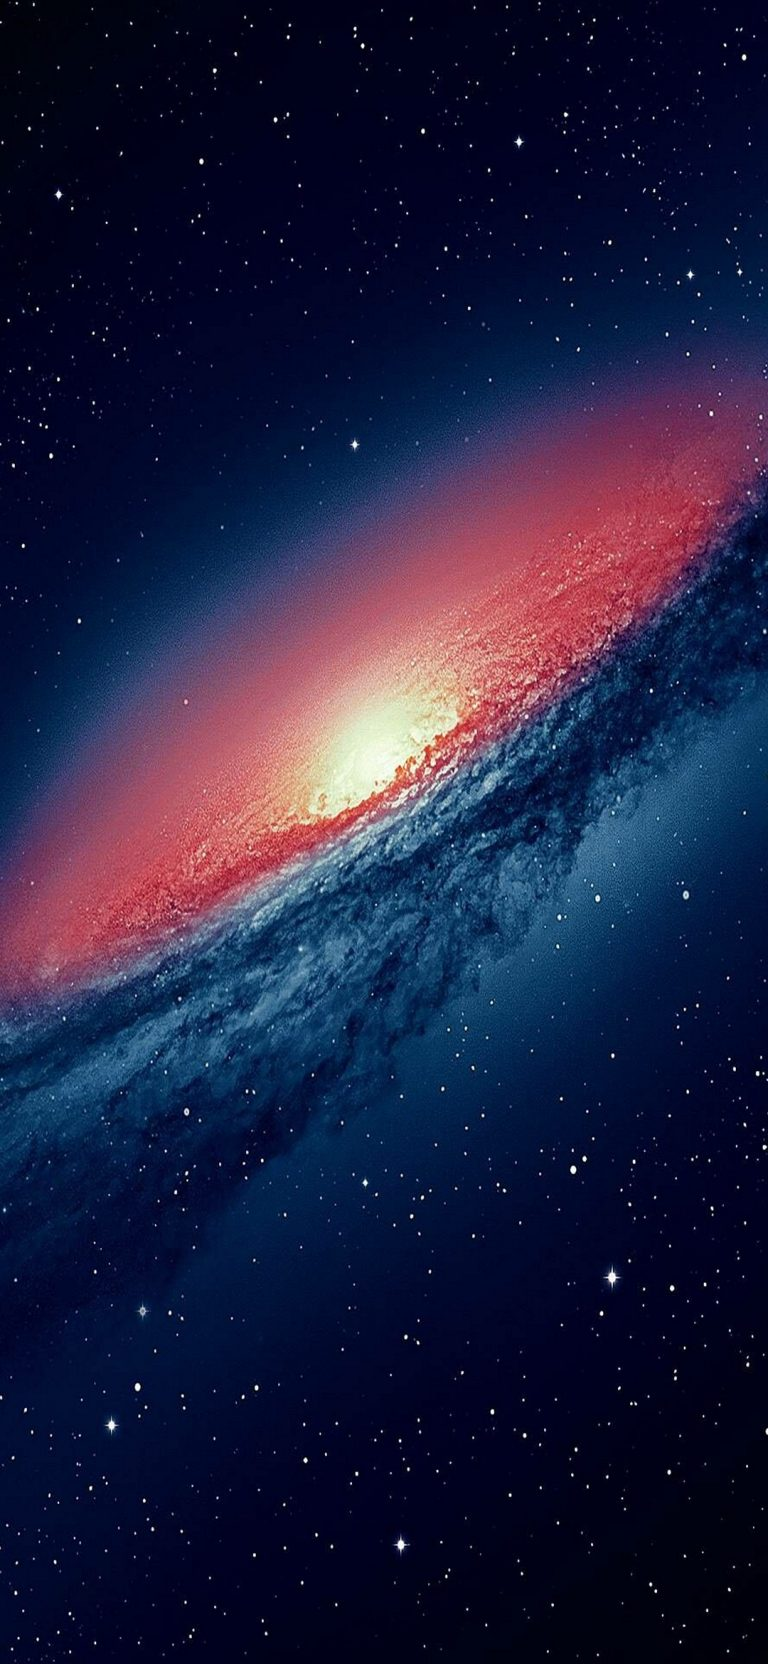 Space Phone Wallpaper 136 1080x2340 768x1664